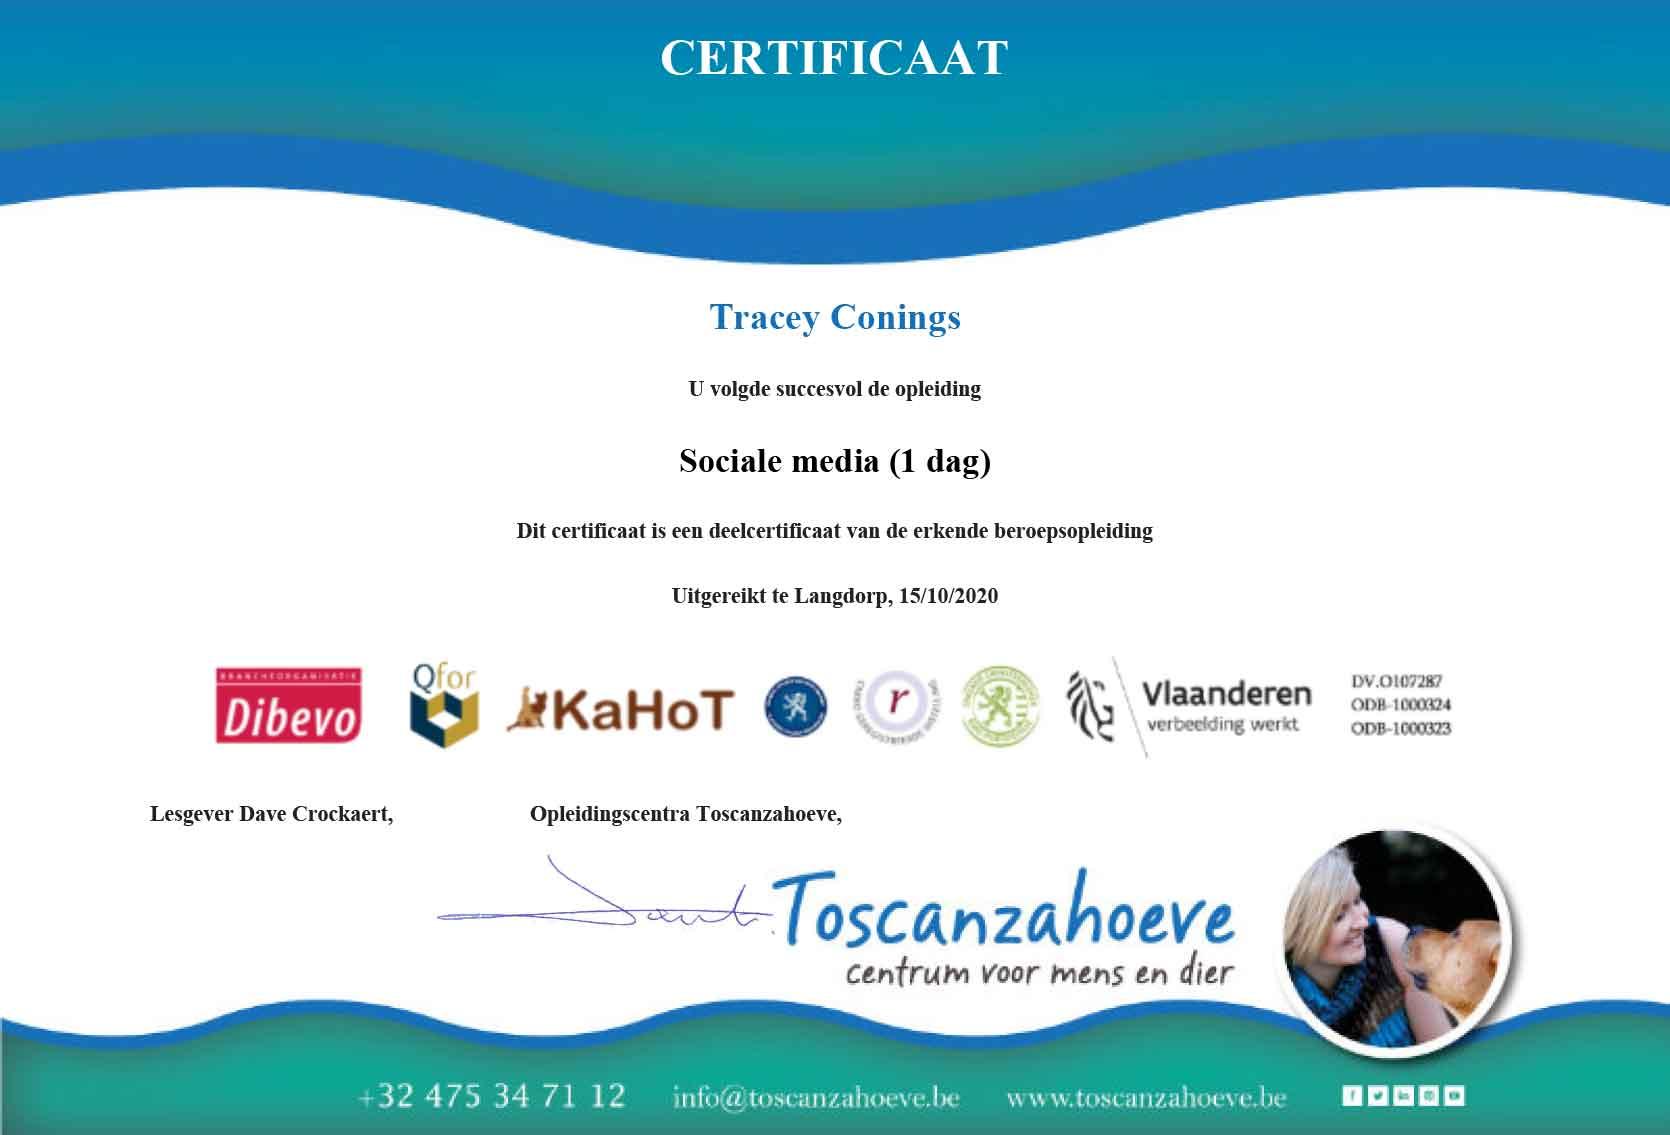 Certificaat Sociale media Tracey Conings